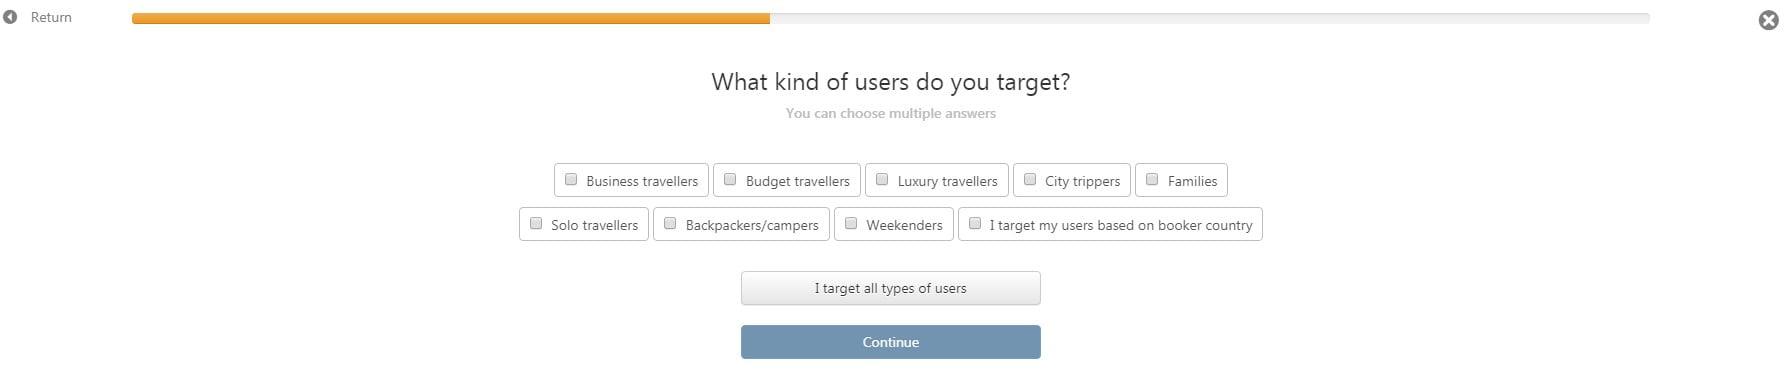 target blog viajes